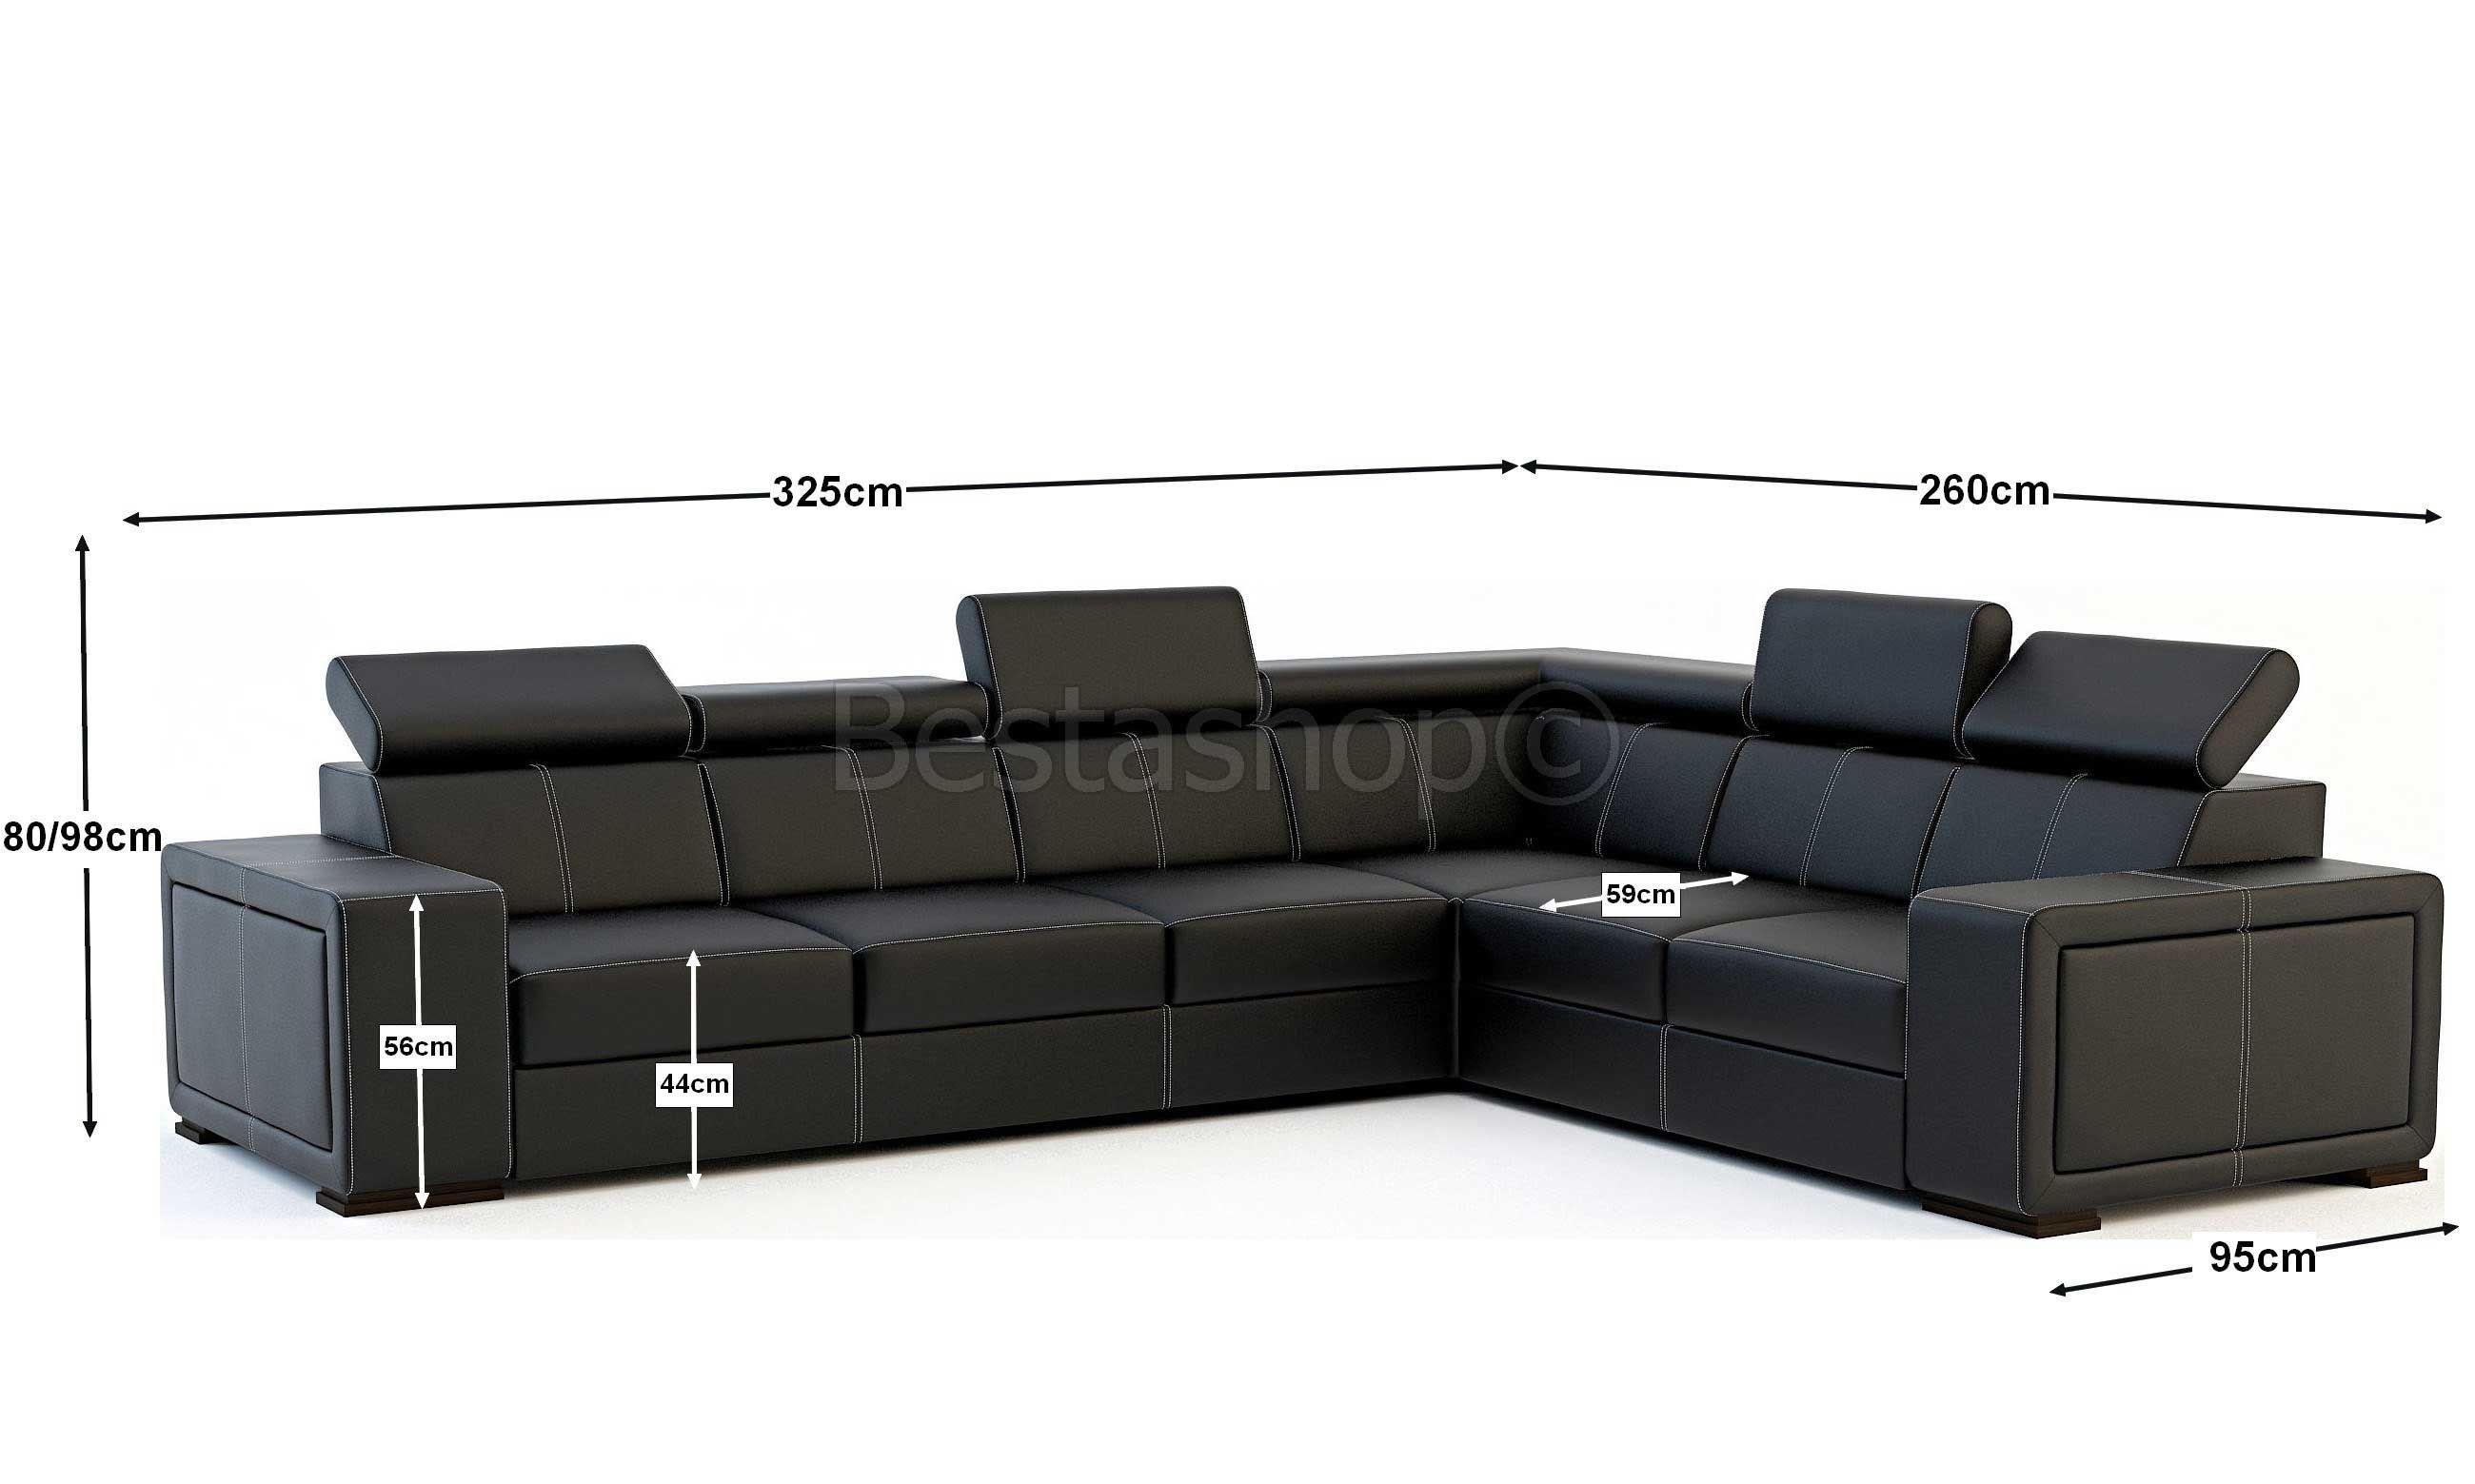 Attirant Le Bon Coin Canape D Angle Occasion Dans Le Brillant Et Magnifique Canape Petite Tai In 2020 Sectional Couch Couch Furniture